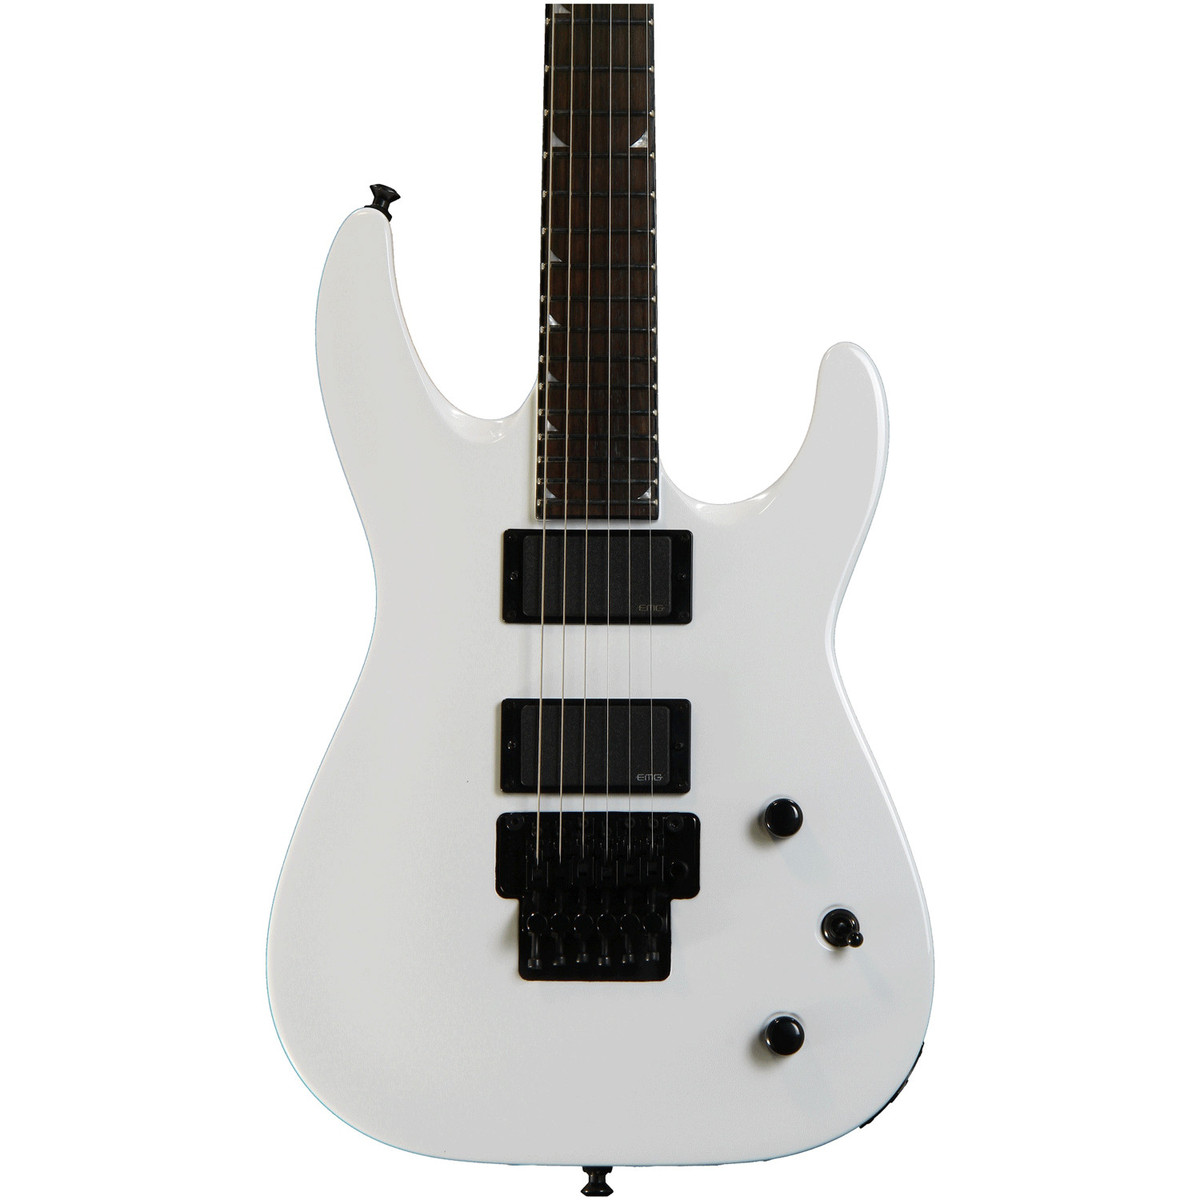 jackson x series slatxmg3 6 soloist electric guitar snow white at. Black Bedroom Furniture Sets. Home Design Ideas